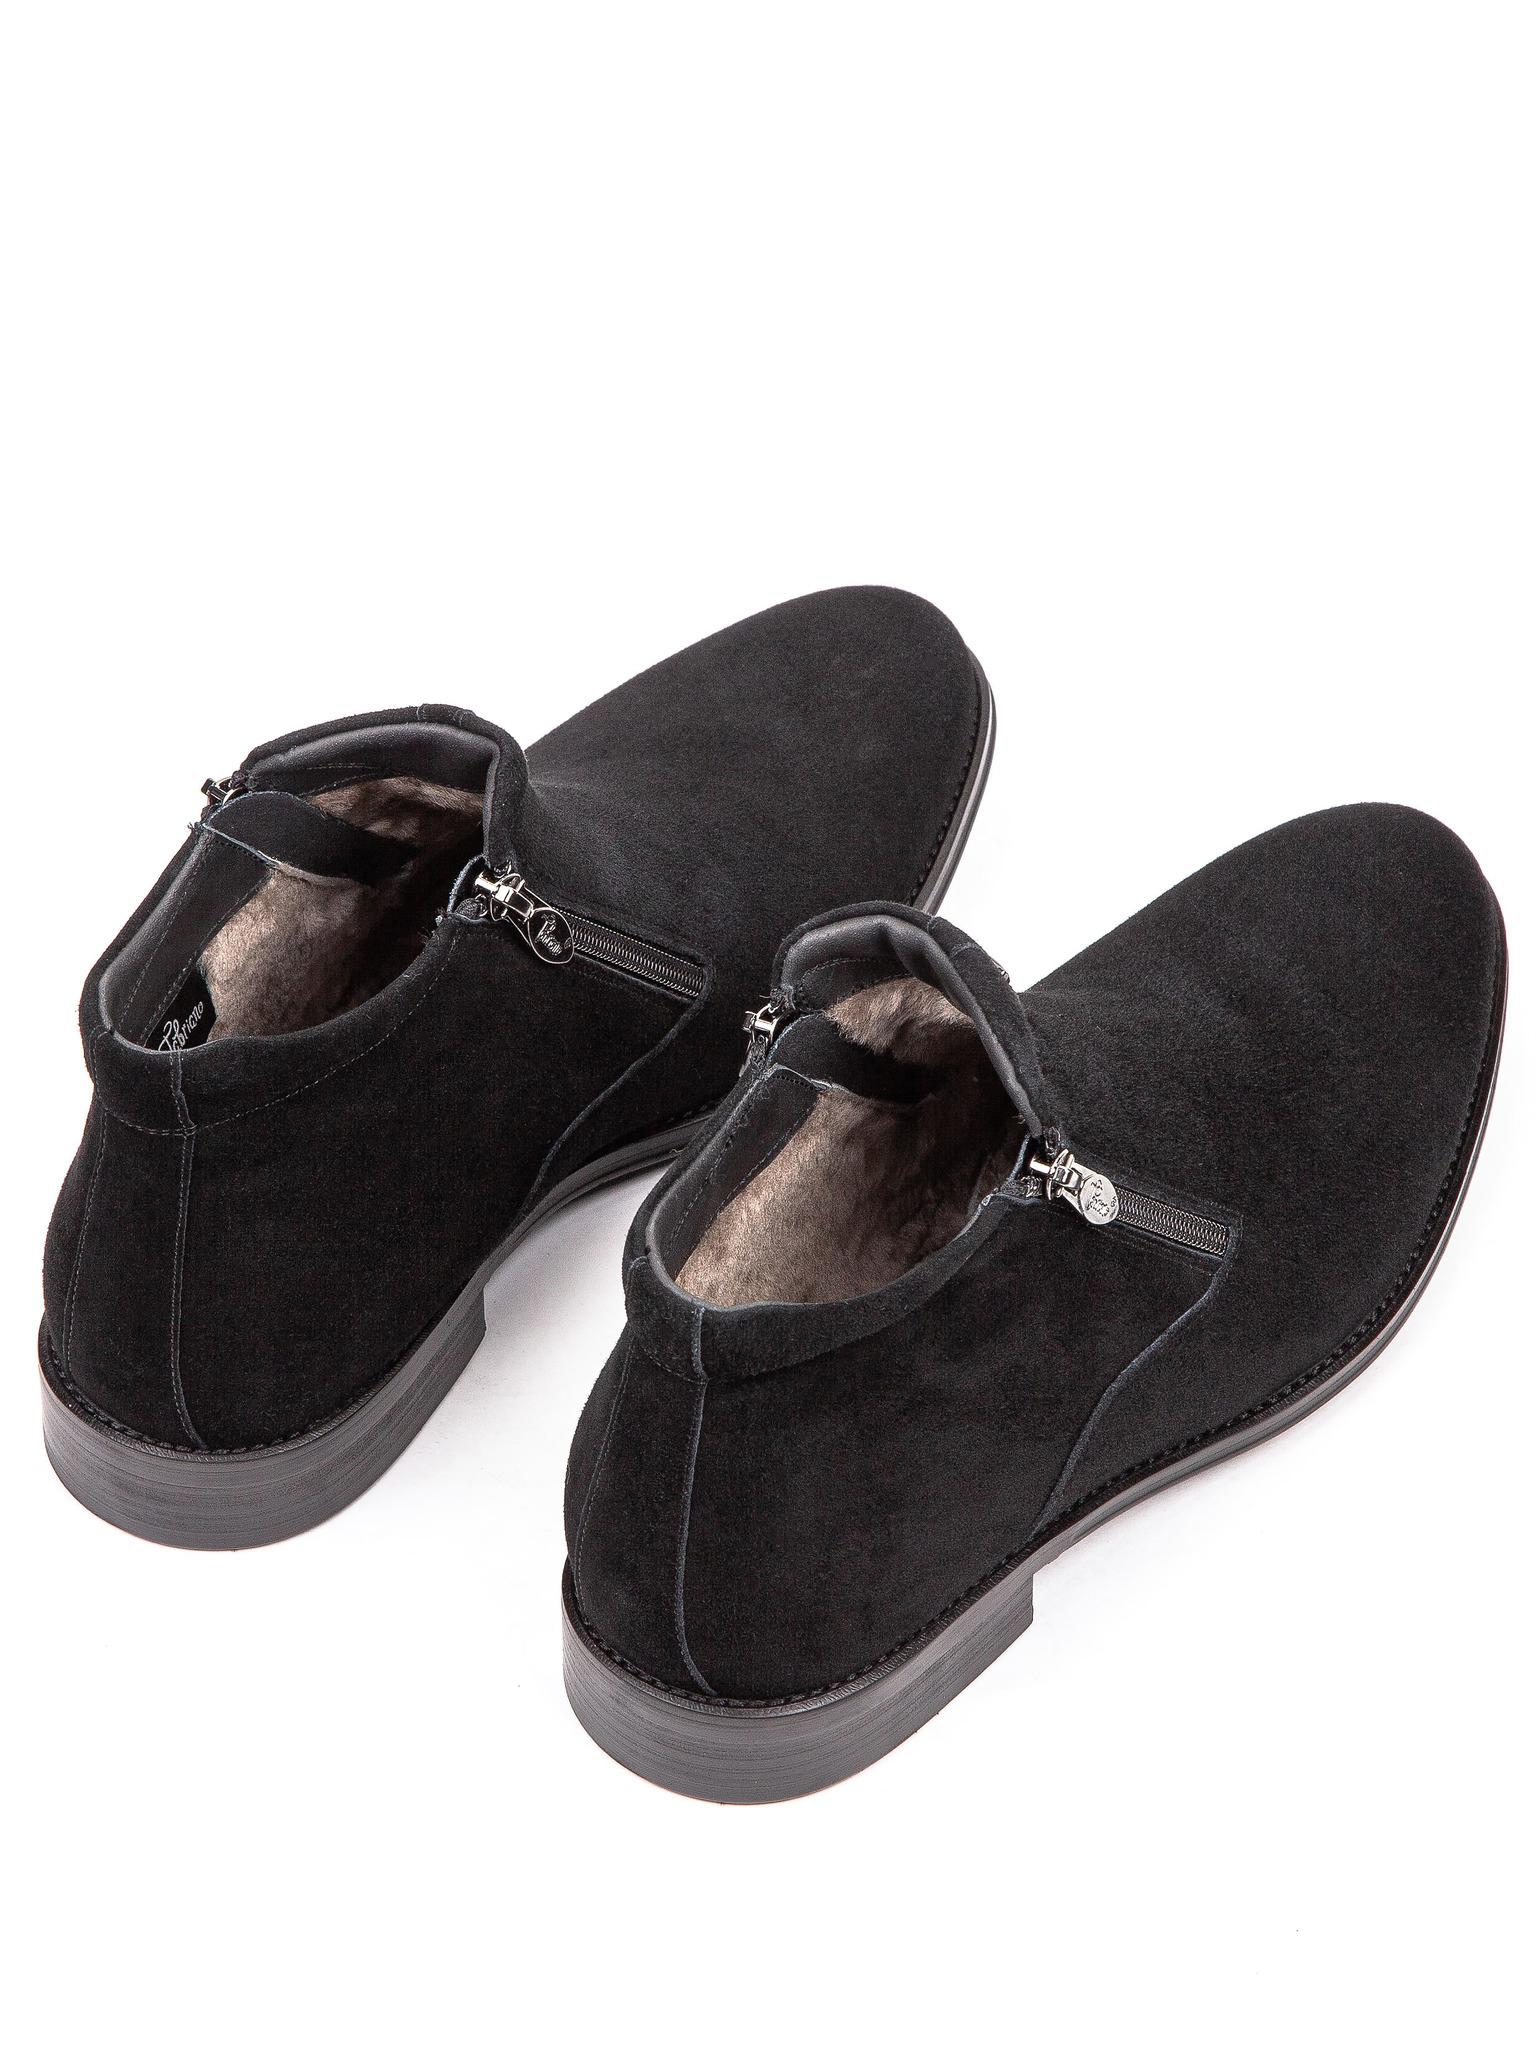 TABRIANO ботинки мужские зимние